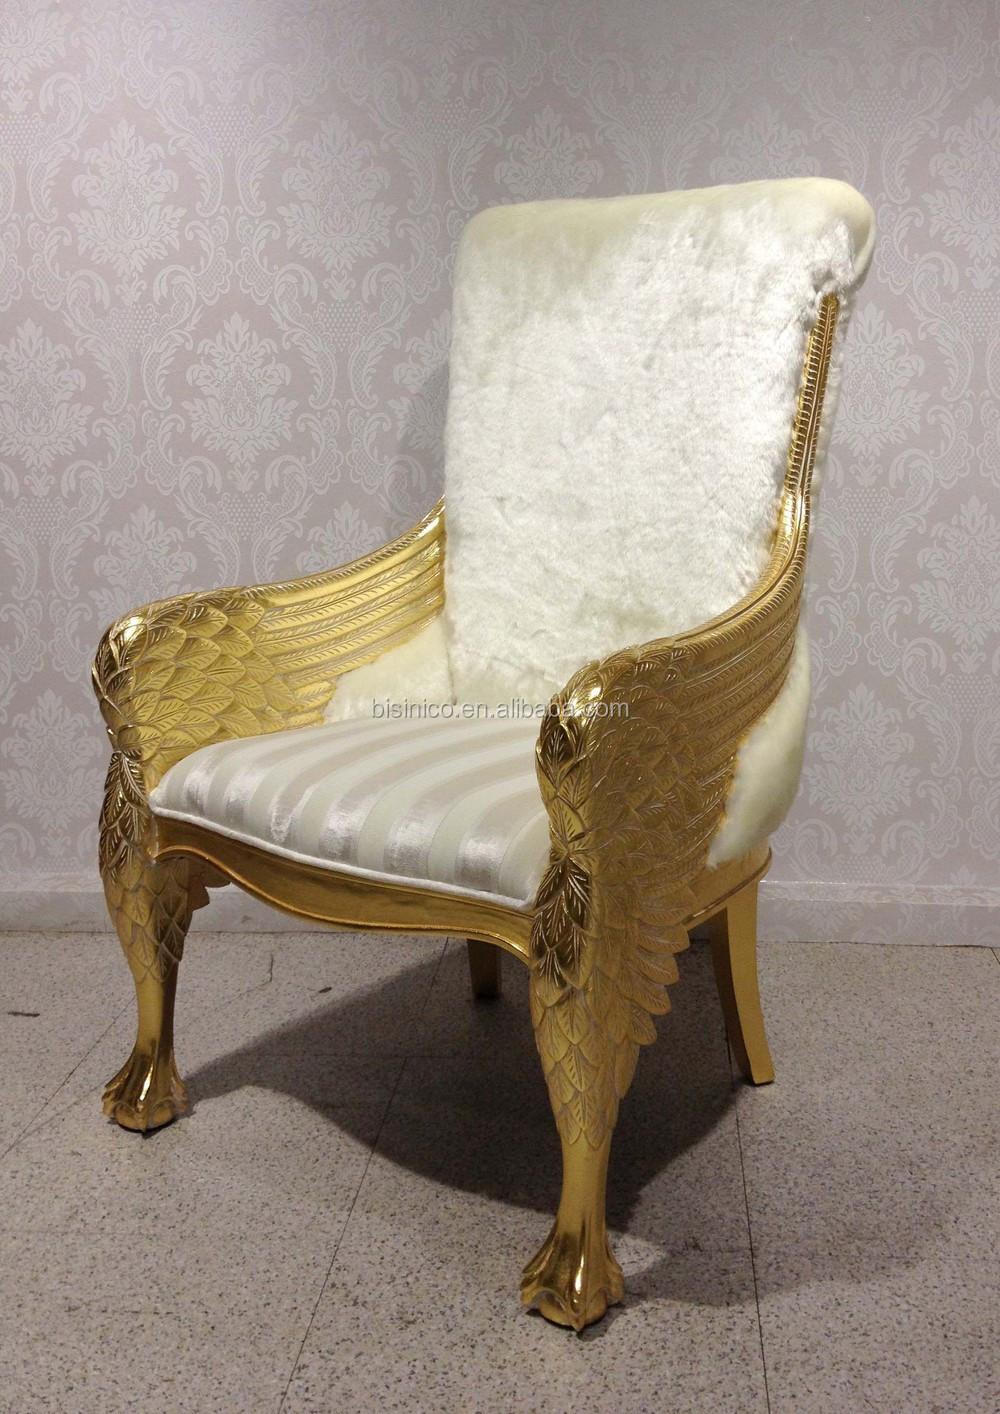 style am ricain meubles canap chaise antique luxe en cuir v ritable tr ne canap classique. Black Bedroom Furniture Sets. Home Design Ideas